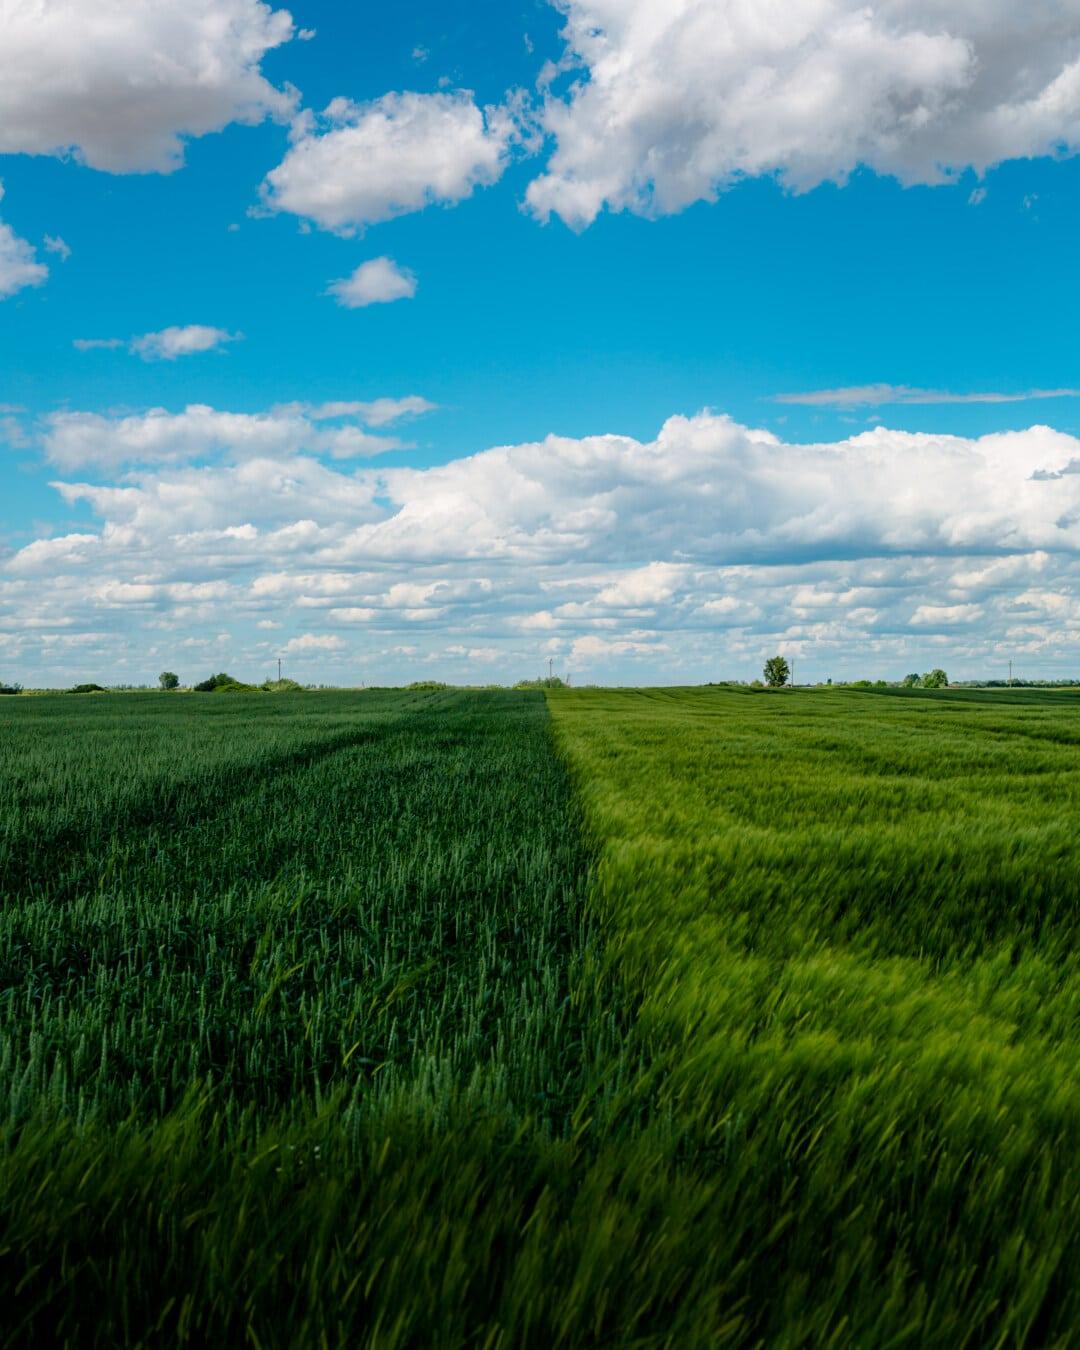 wheatfield, landscape, farm, meadow, grass, agriculture, cloud, rural, field, countryside